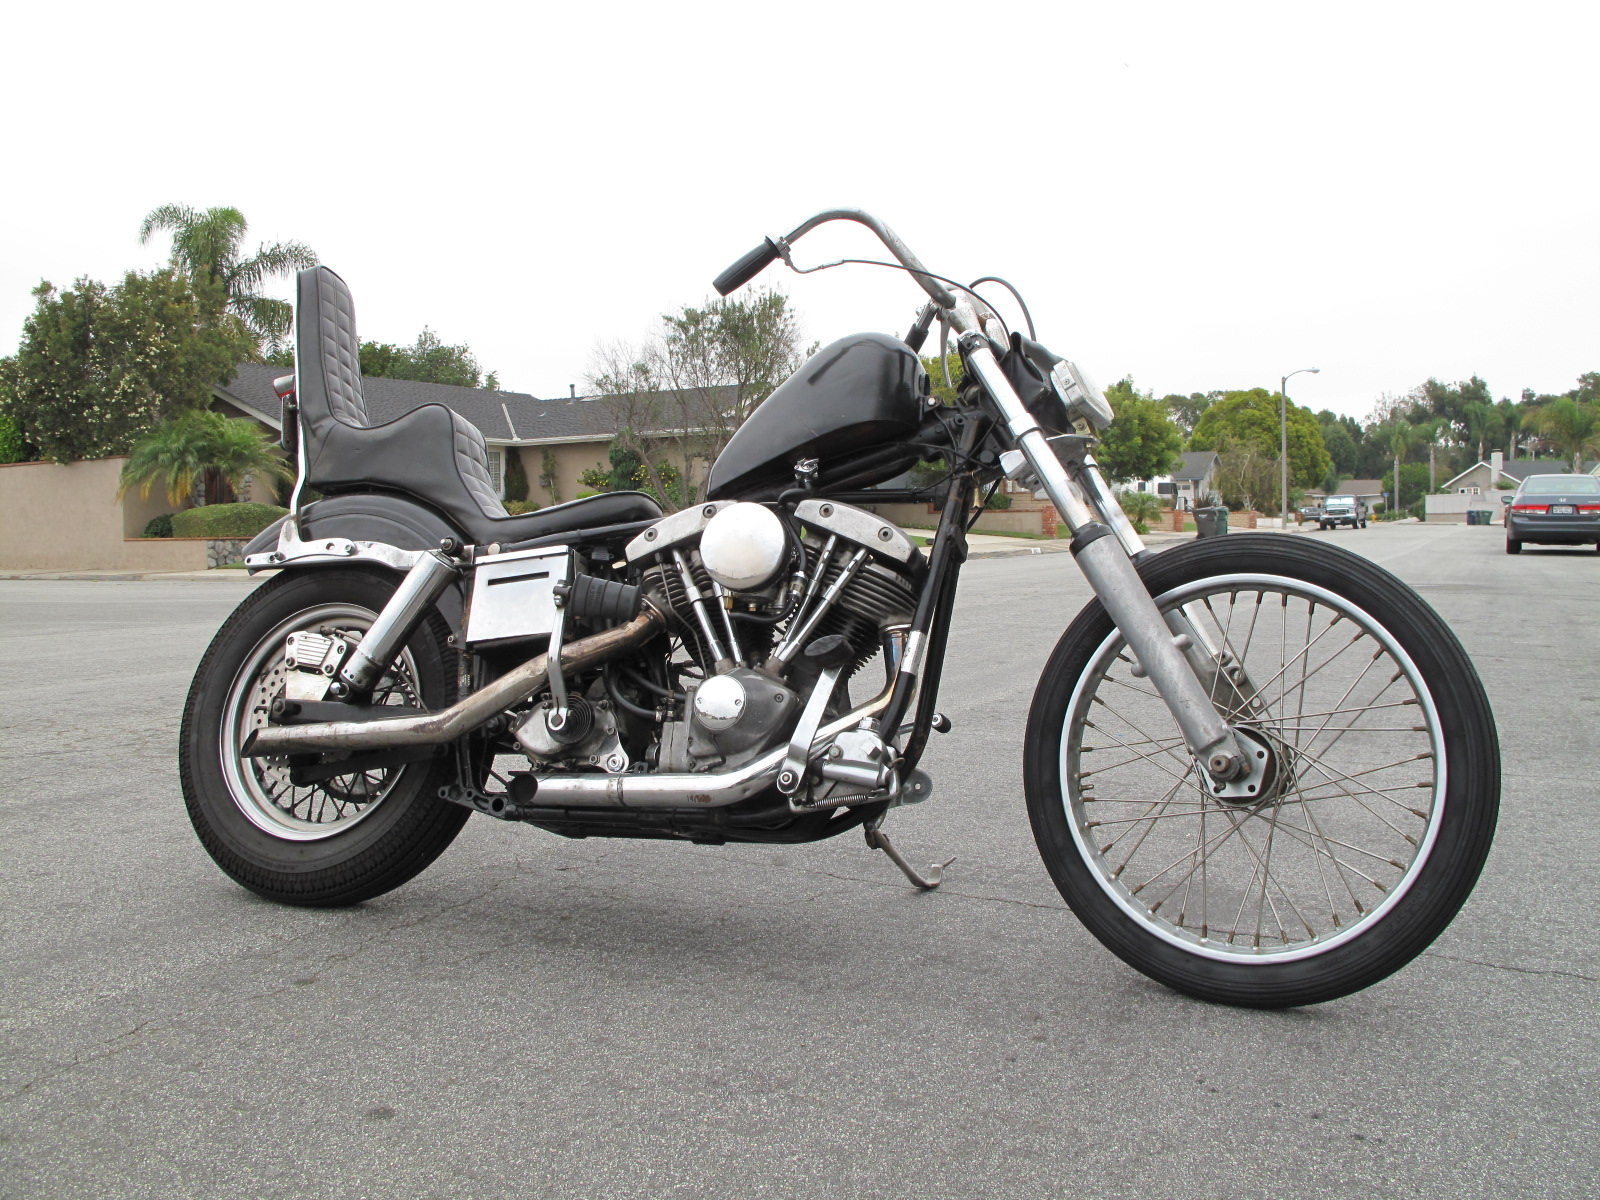 cycle zombies blog: 76 Shovelhead Chopper For Sale